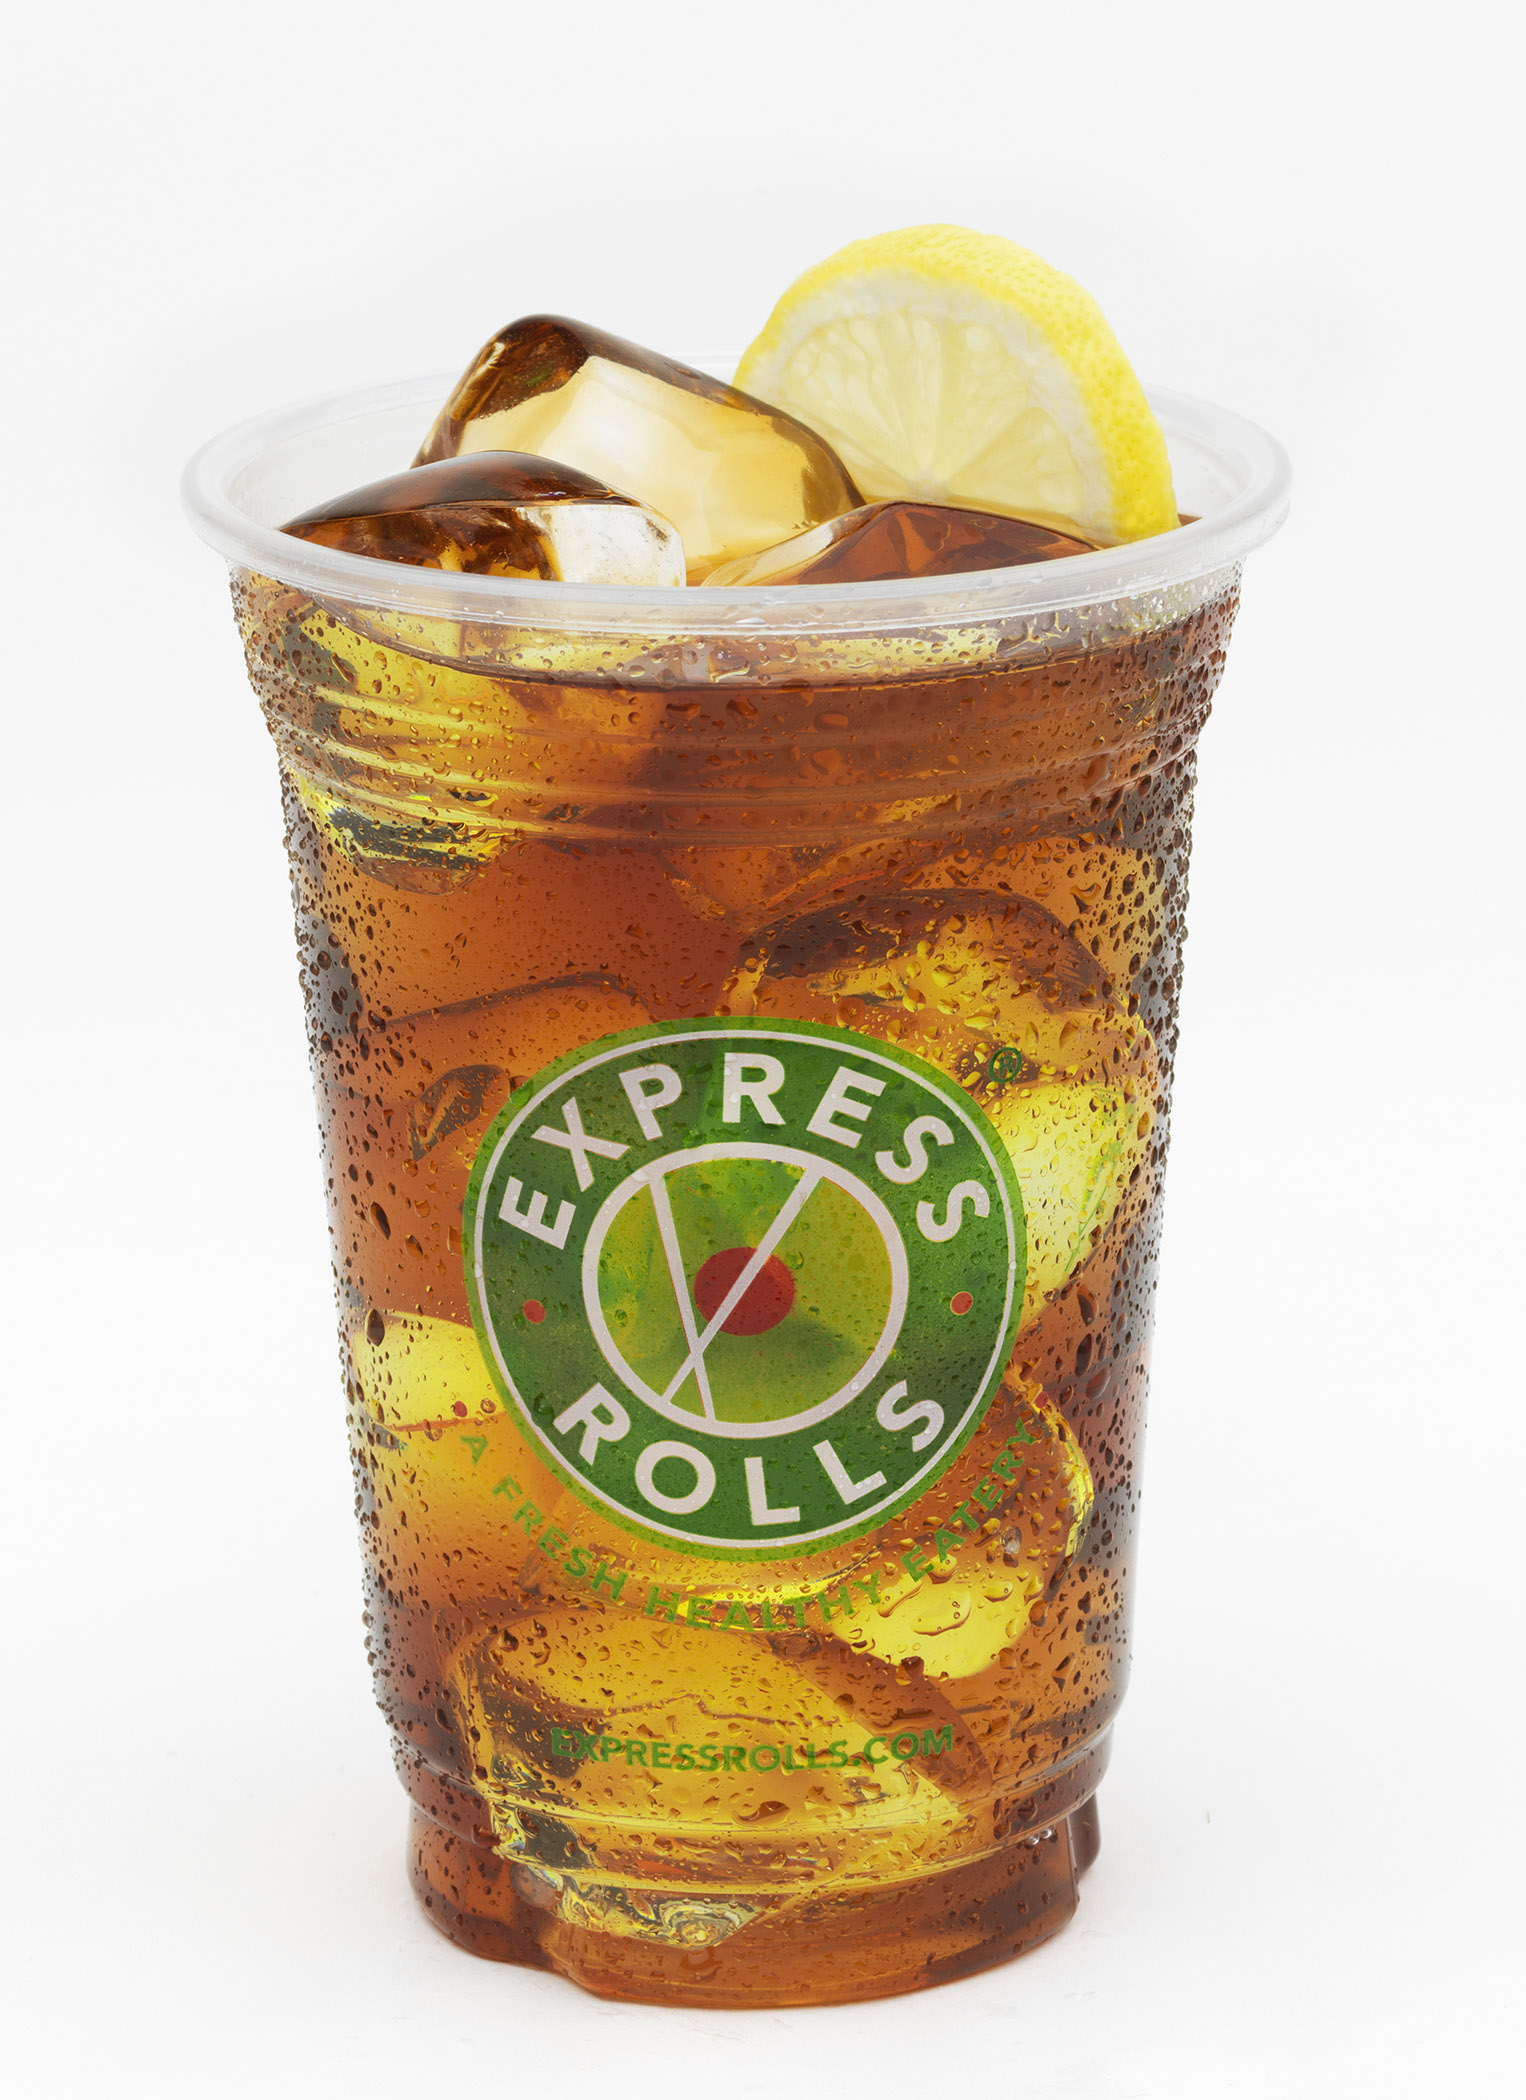 Iced Tea with Lemon Expressrolls.com